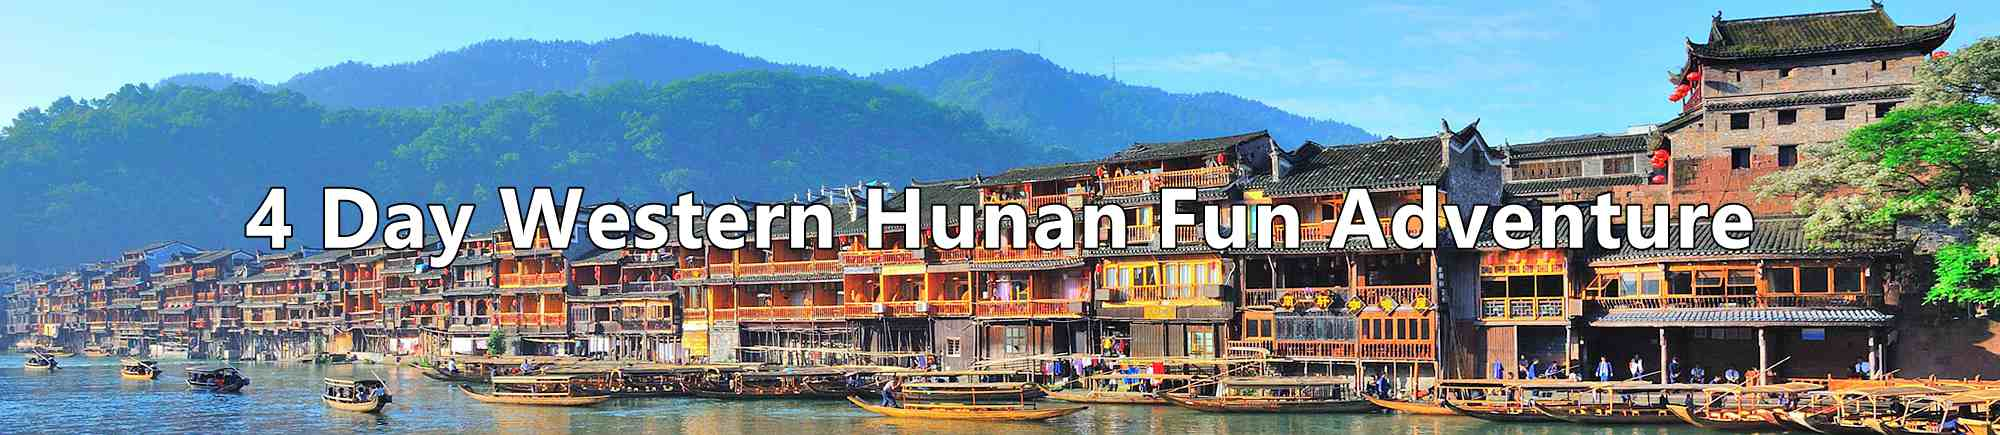 4-day-western-hunan-fun-adventure.jpg